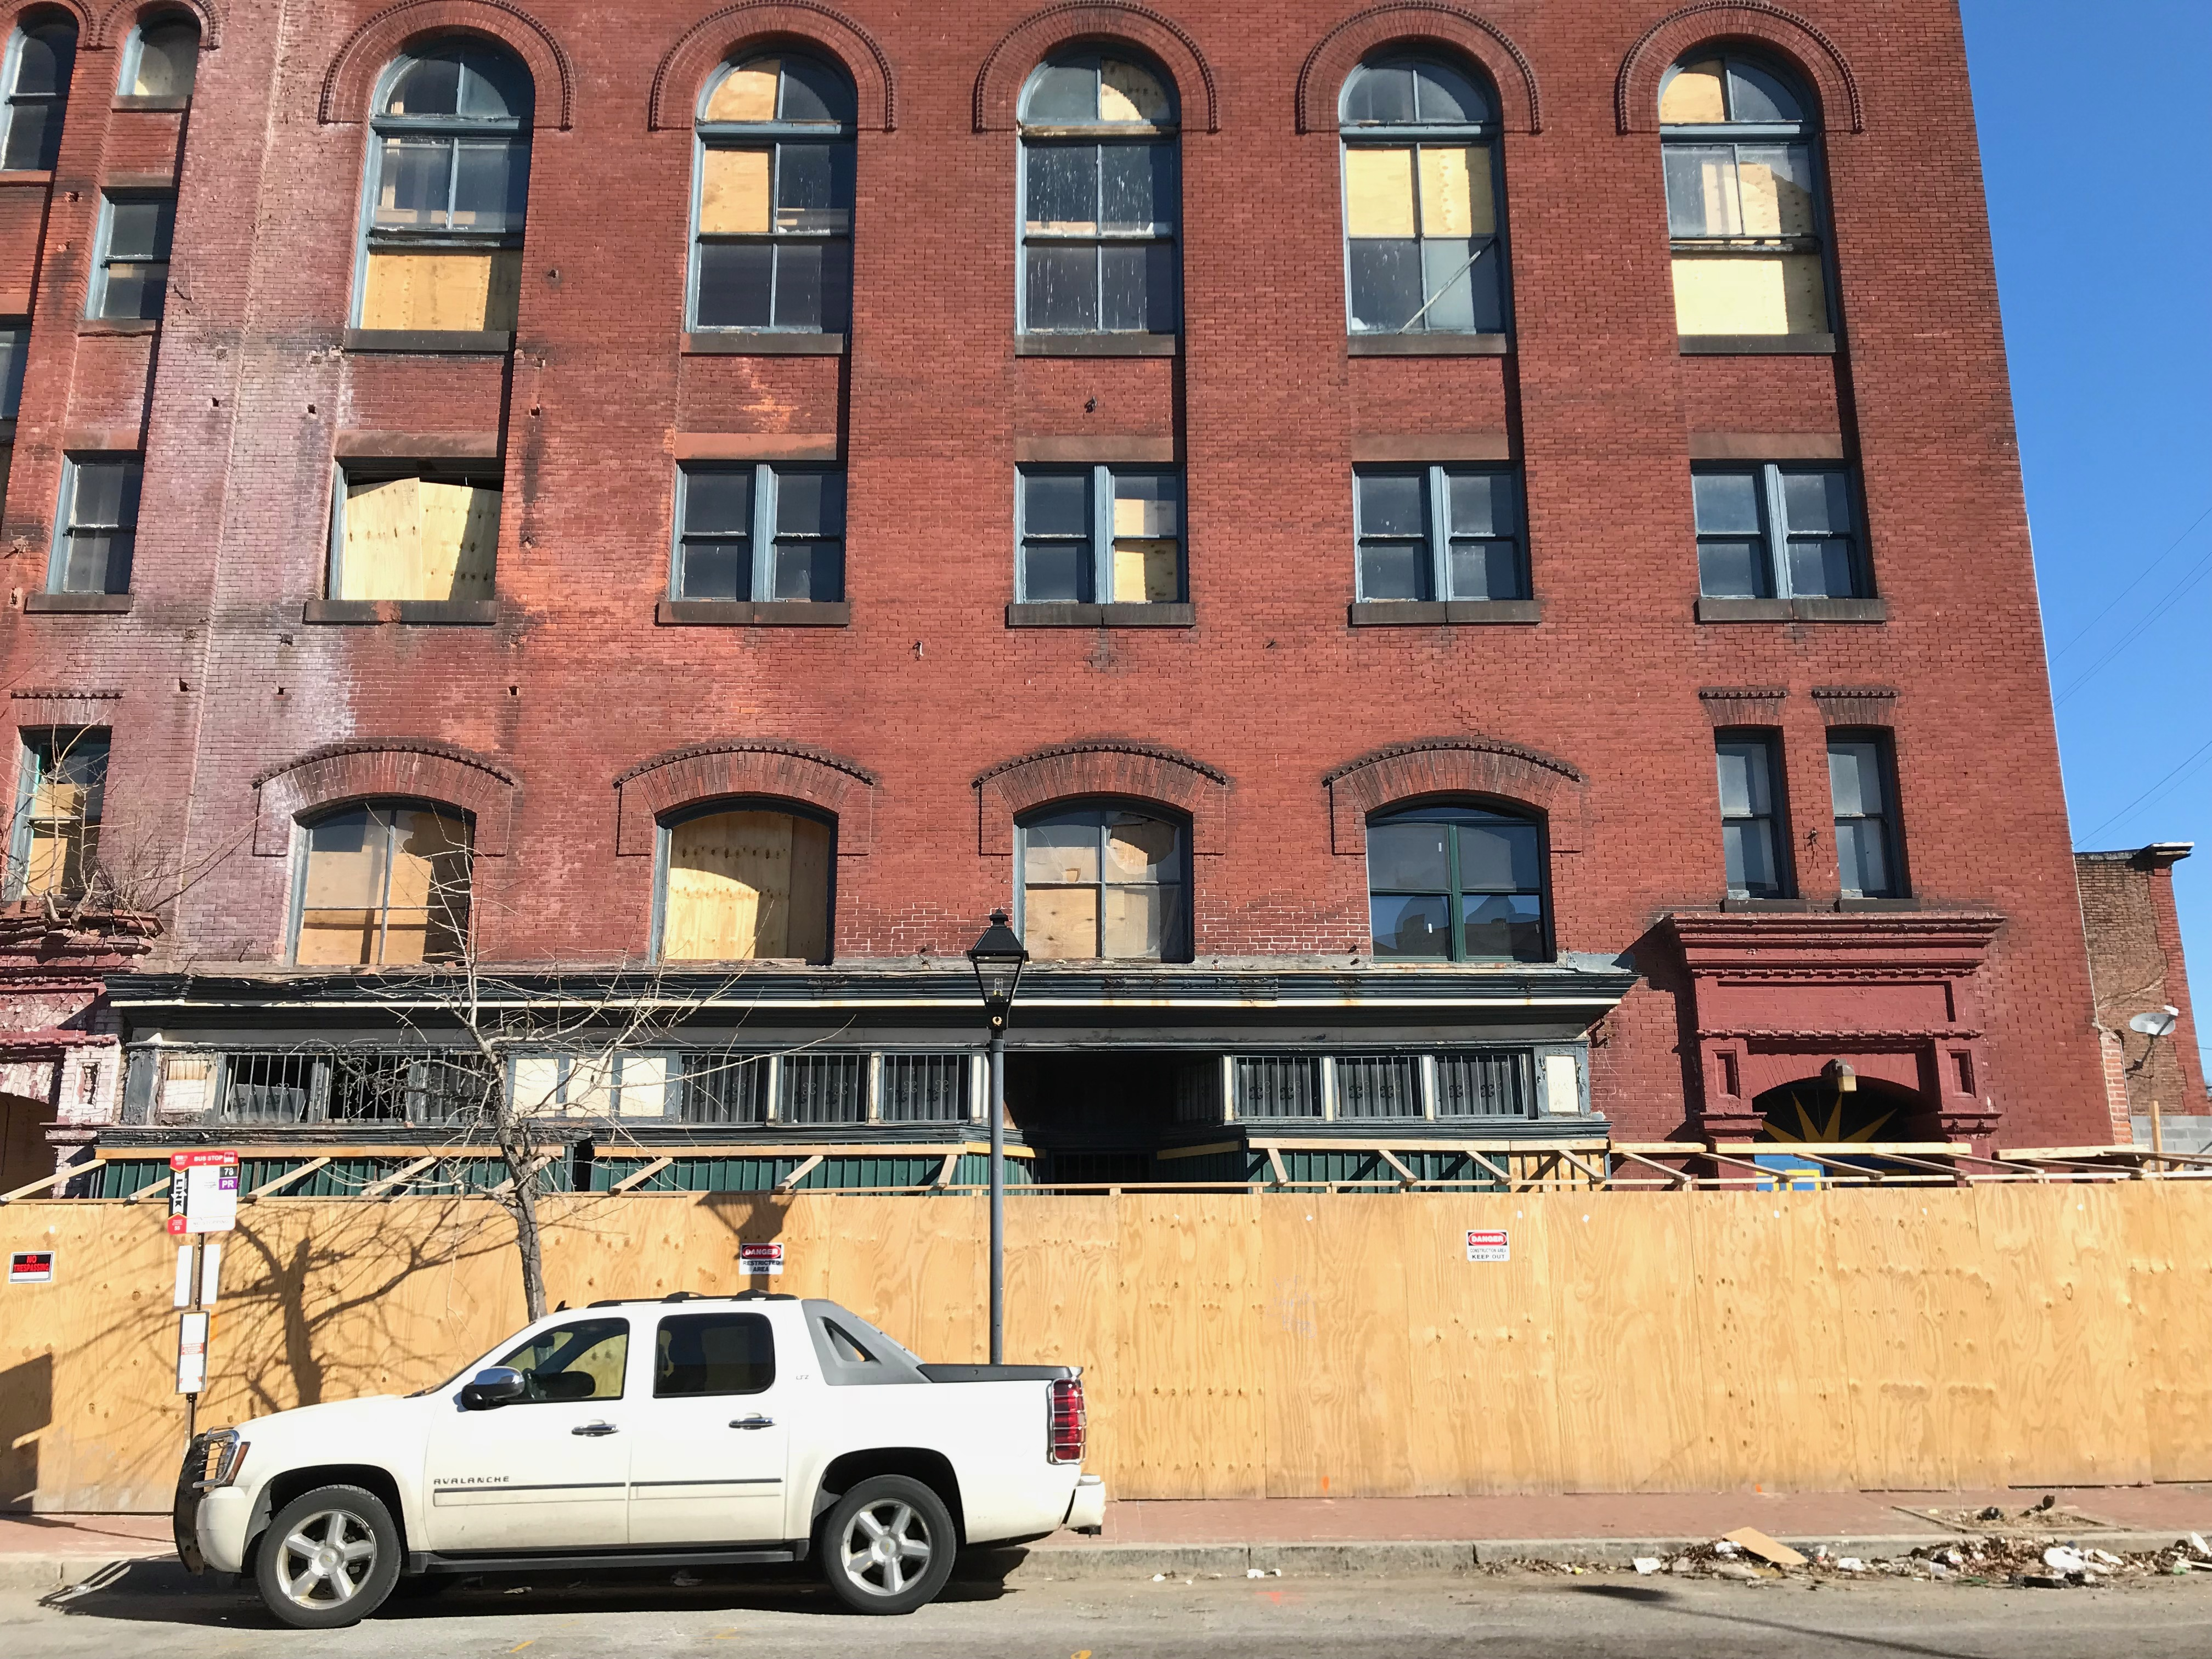 West branch y.m.c.a. building/moore institute (1894; john f. adams, contractor), 1-3 n. carey street, baltimore, md 21223 photo